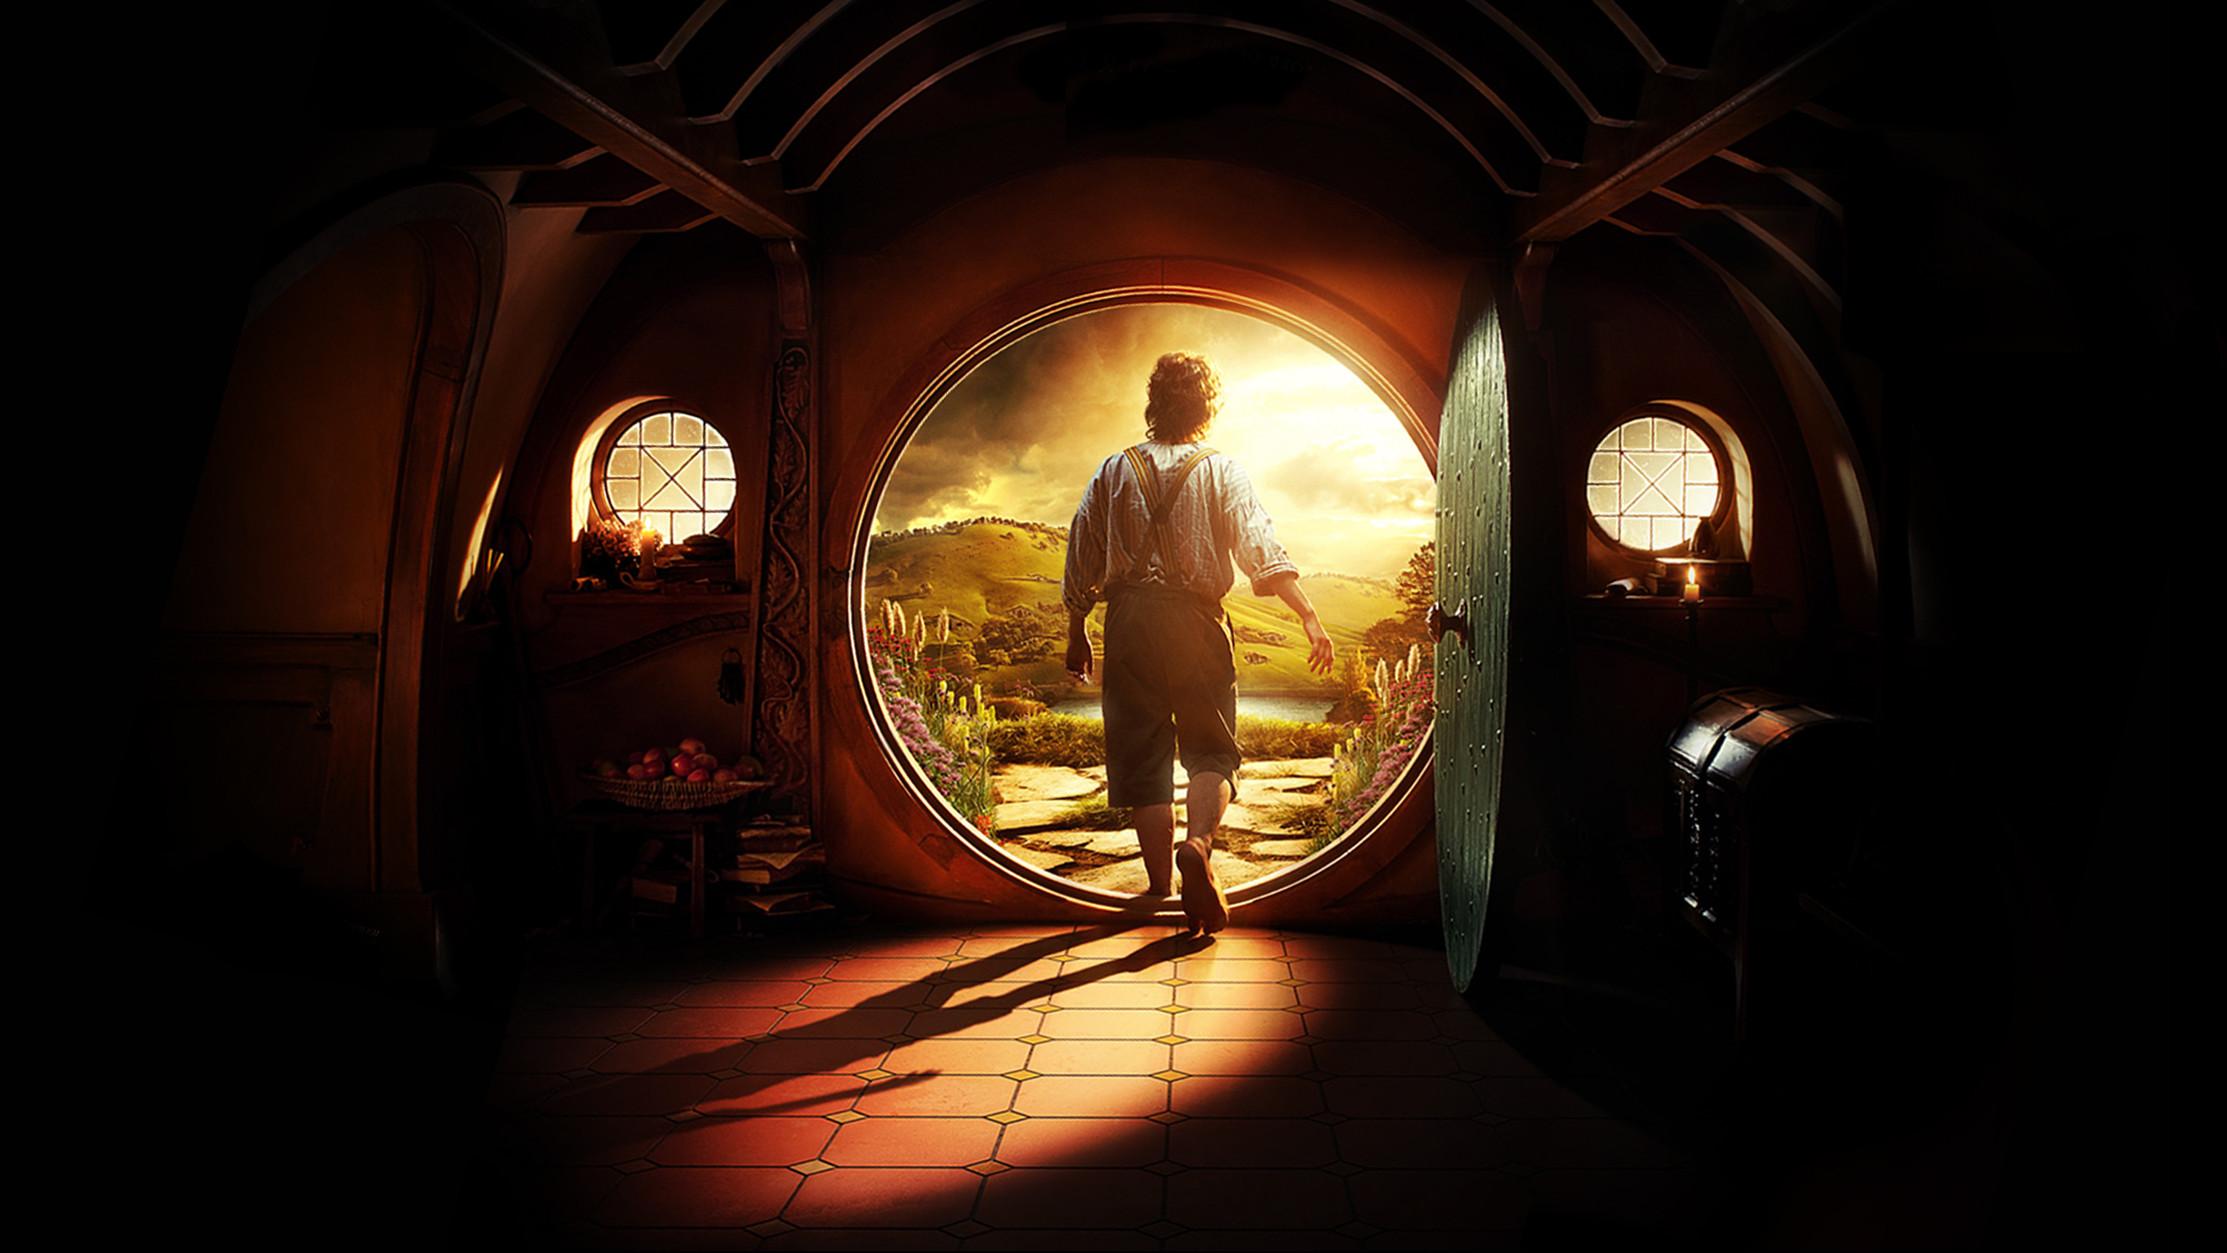 The Hobbit, Hobbits, Bilbo Baggins